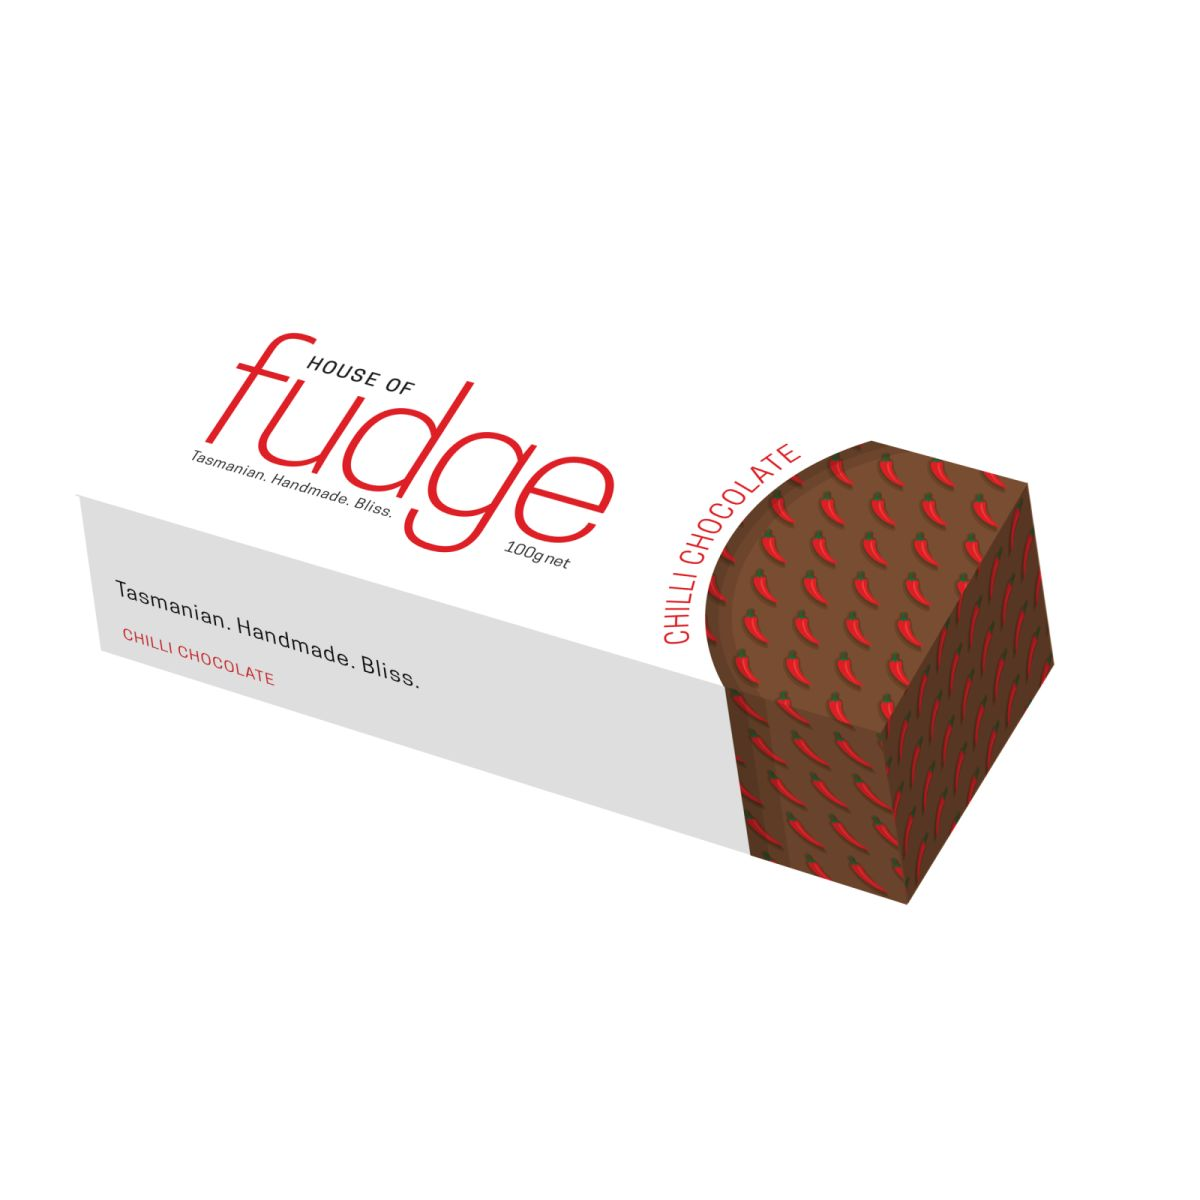 House of Fudge - Chilli Fudge